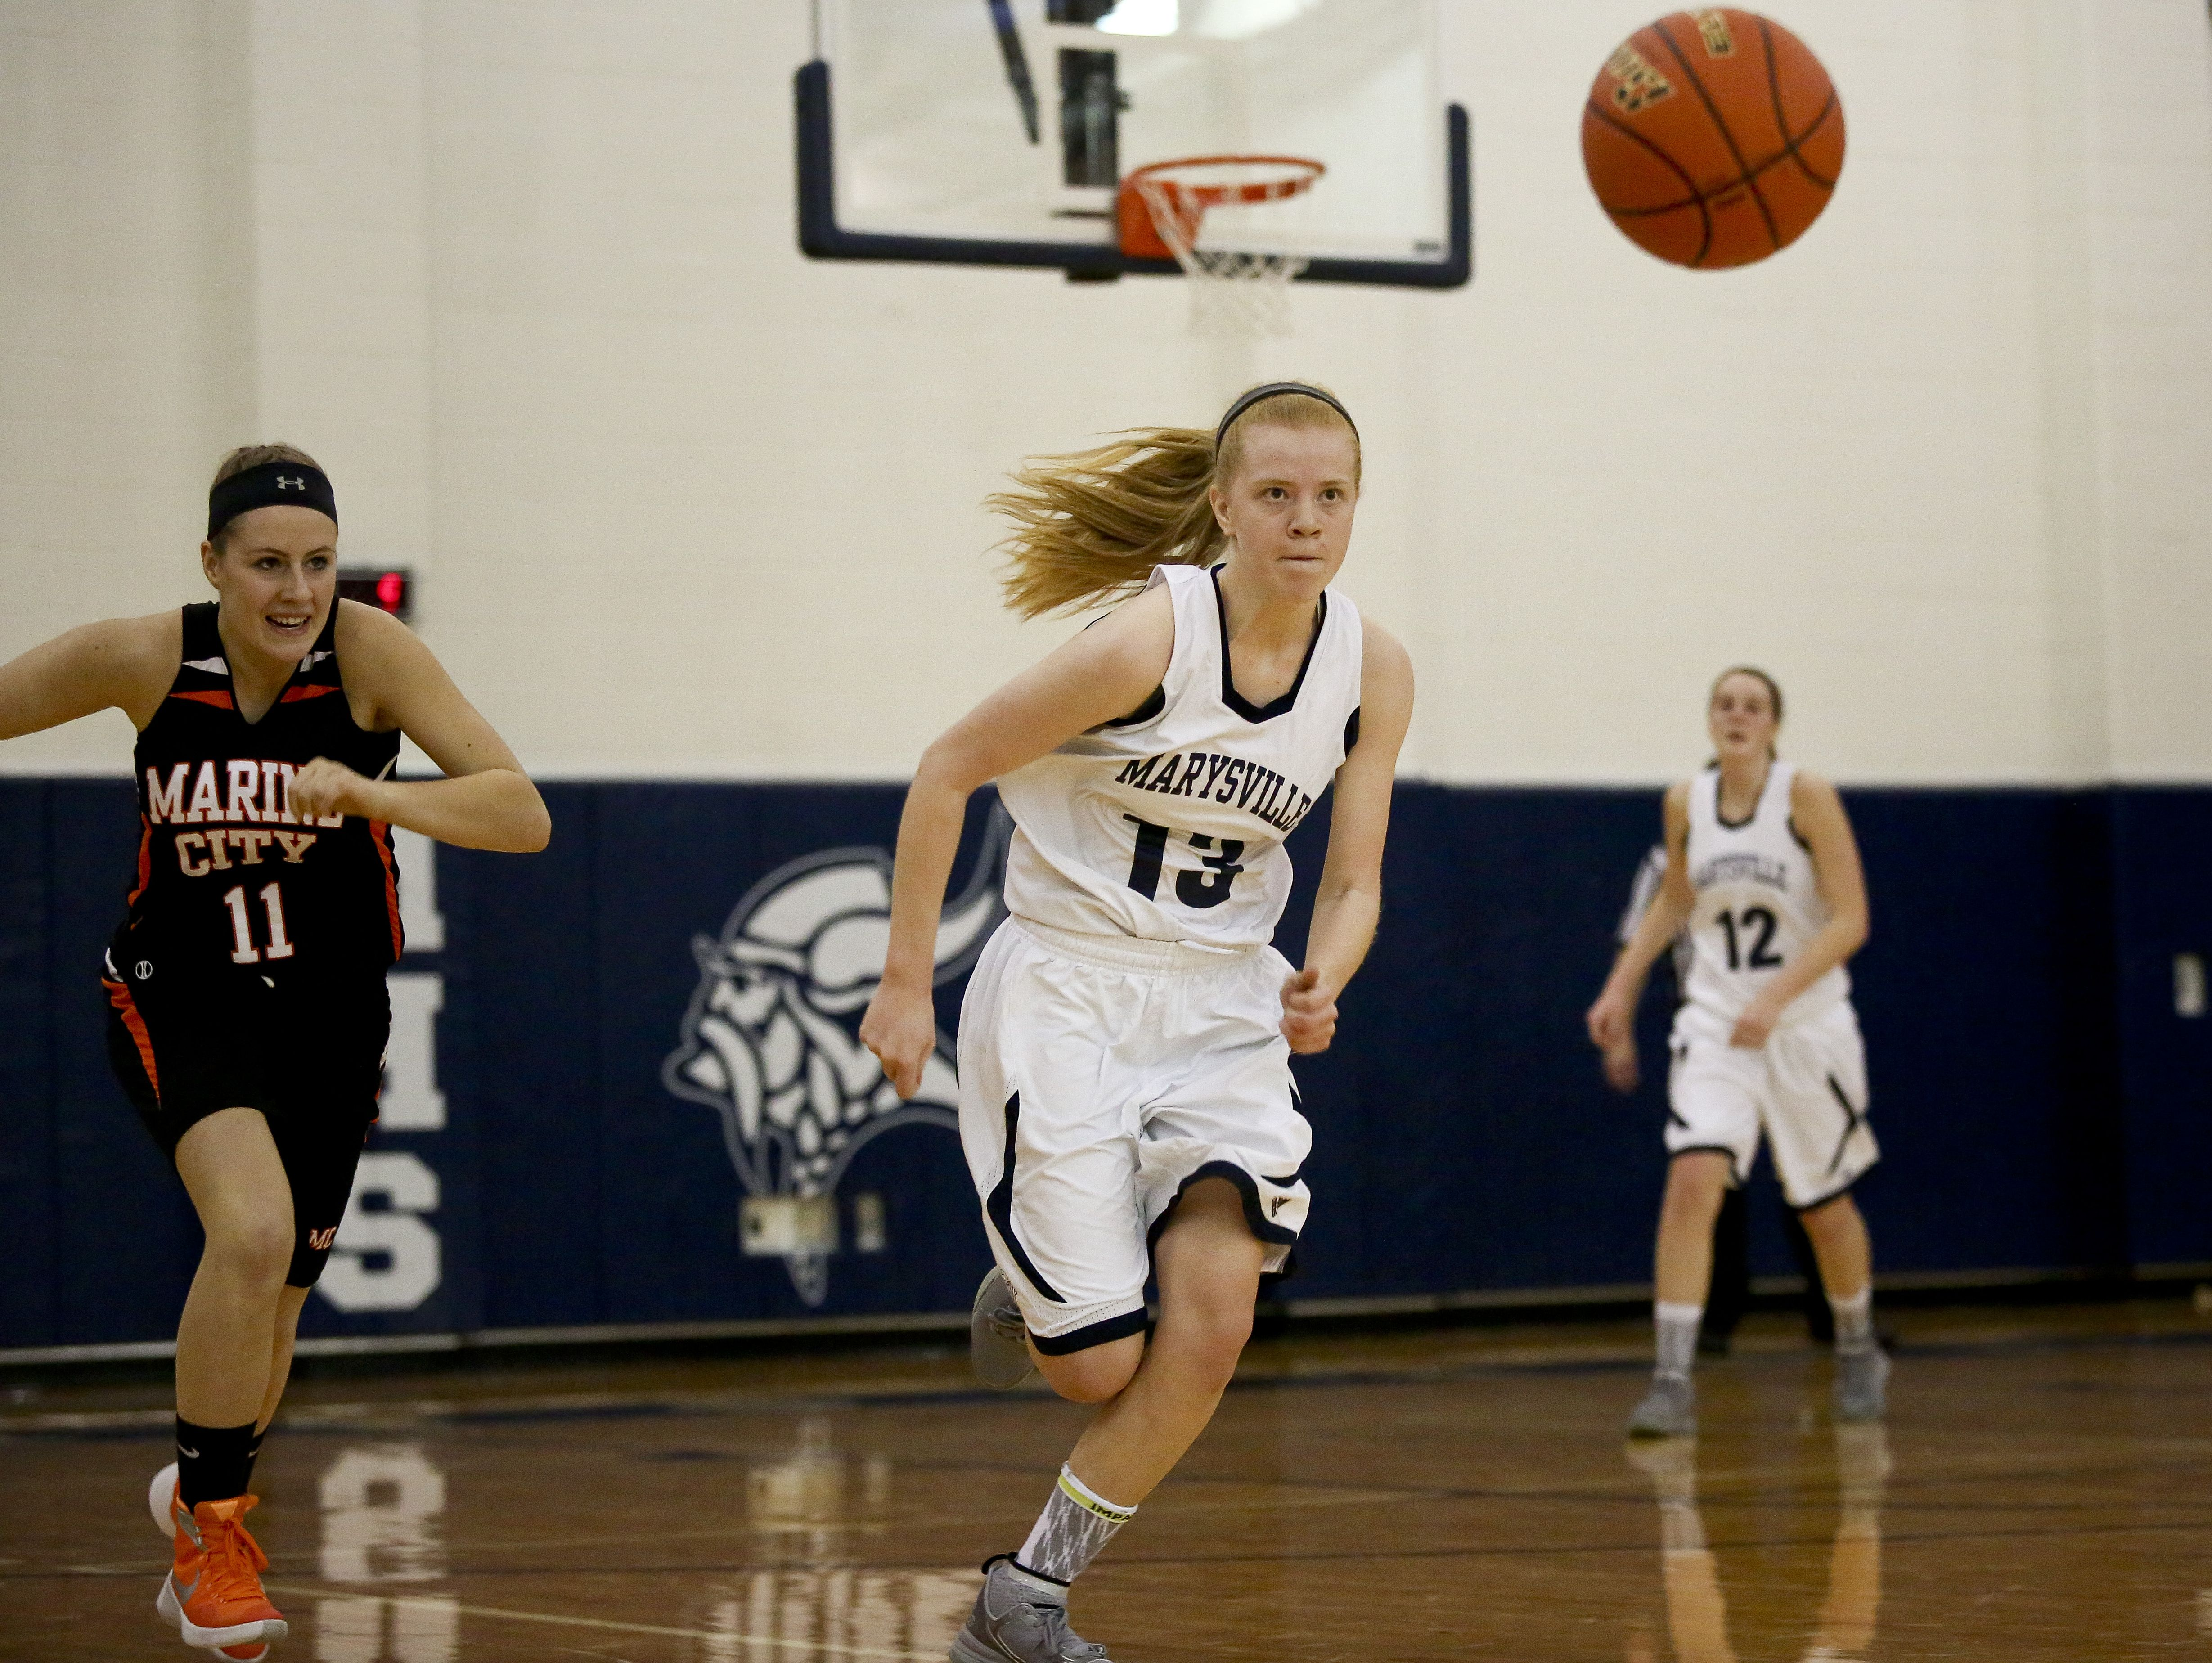 Marysville junior Kiara Kelley sprints for a loose ball during a basketball game Friday, Jan. 8, 2016 at Marysville High School.